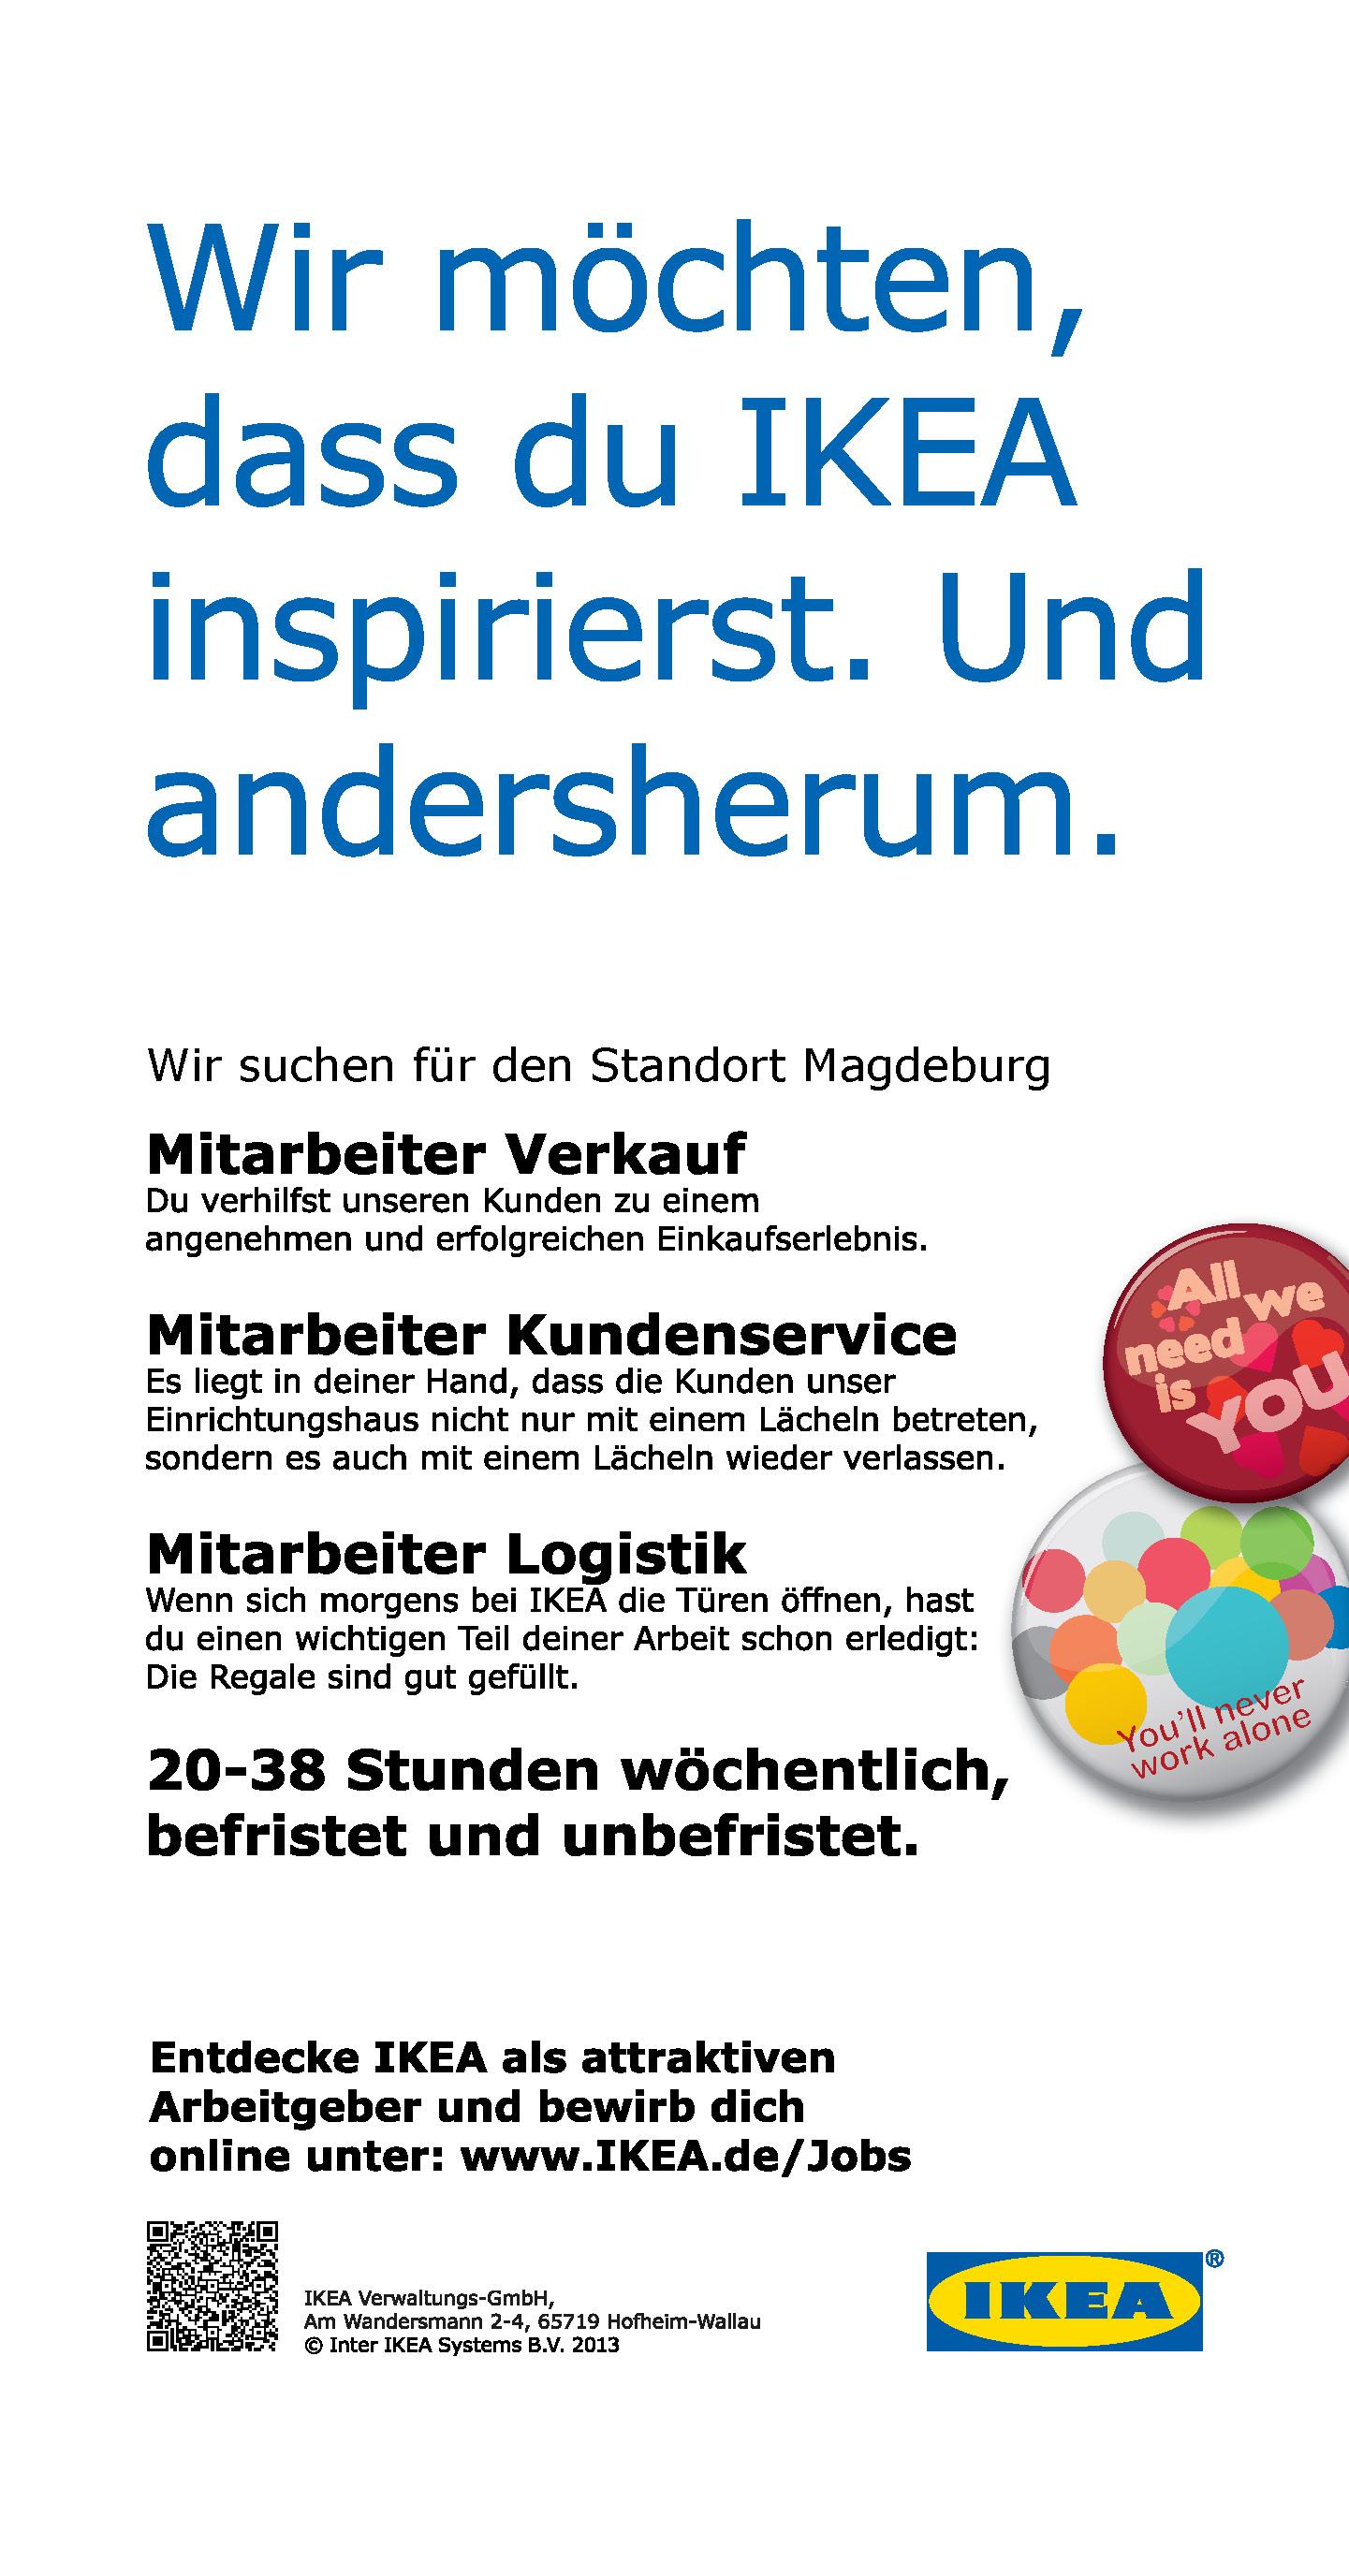 Stellenangebot Ikea Magdeburg Magdeburger News Das